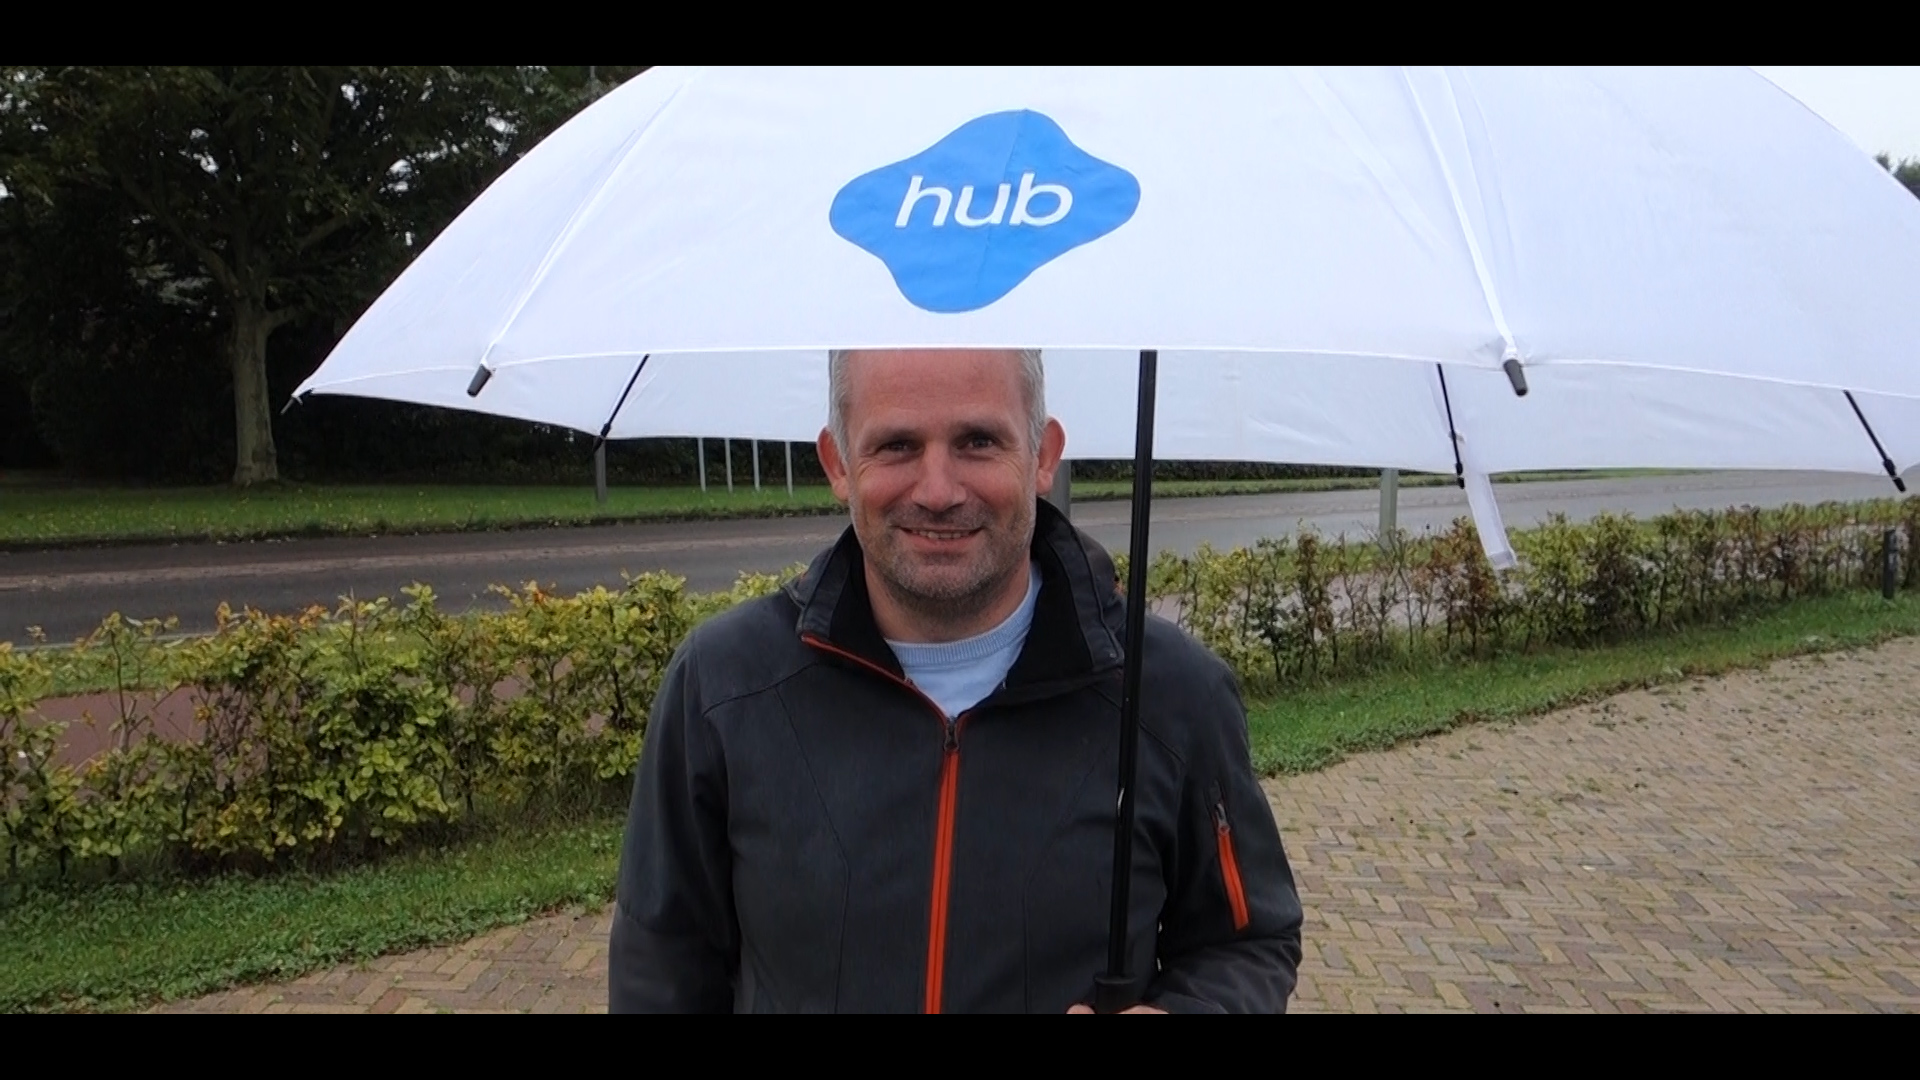 Videoverslag Hubs Drenthe-Groningen